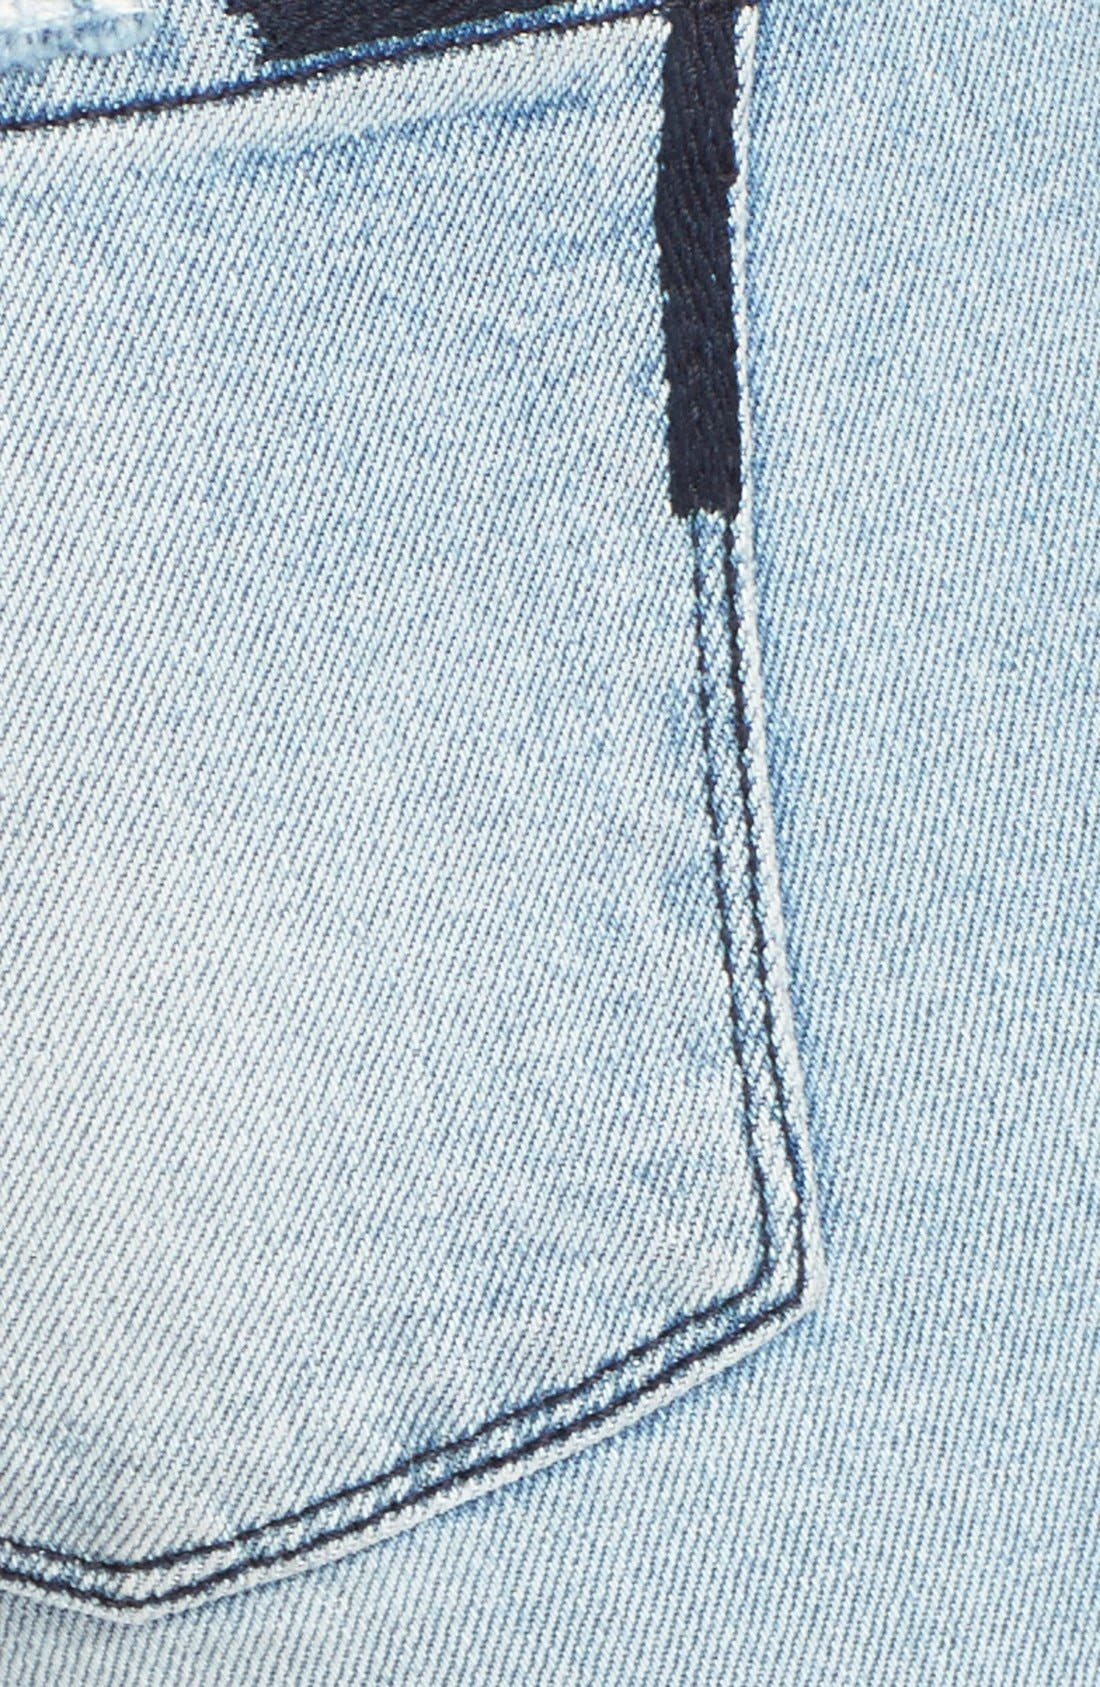 Alternate Image 3  - RtA 'Icon' Destroyed Skinny Jeans